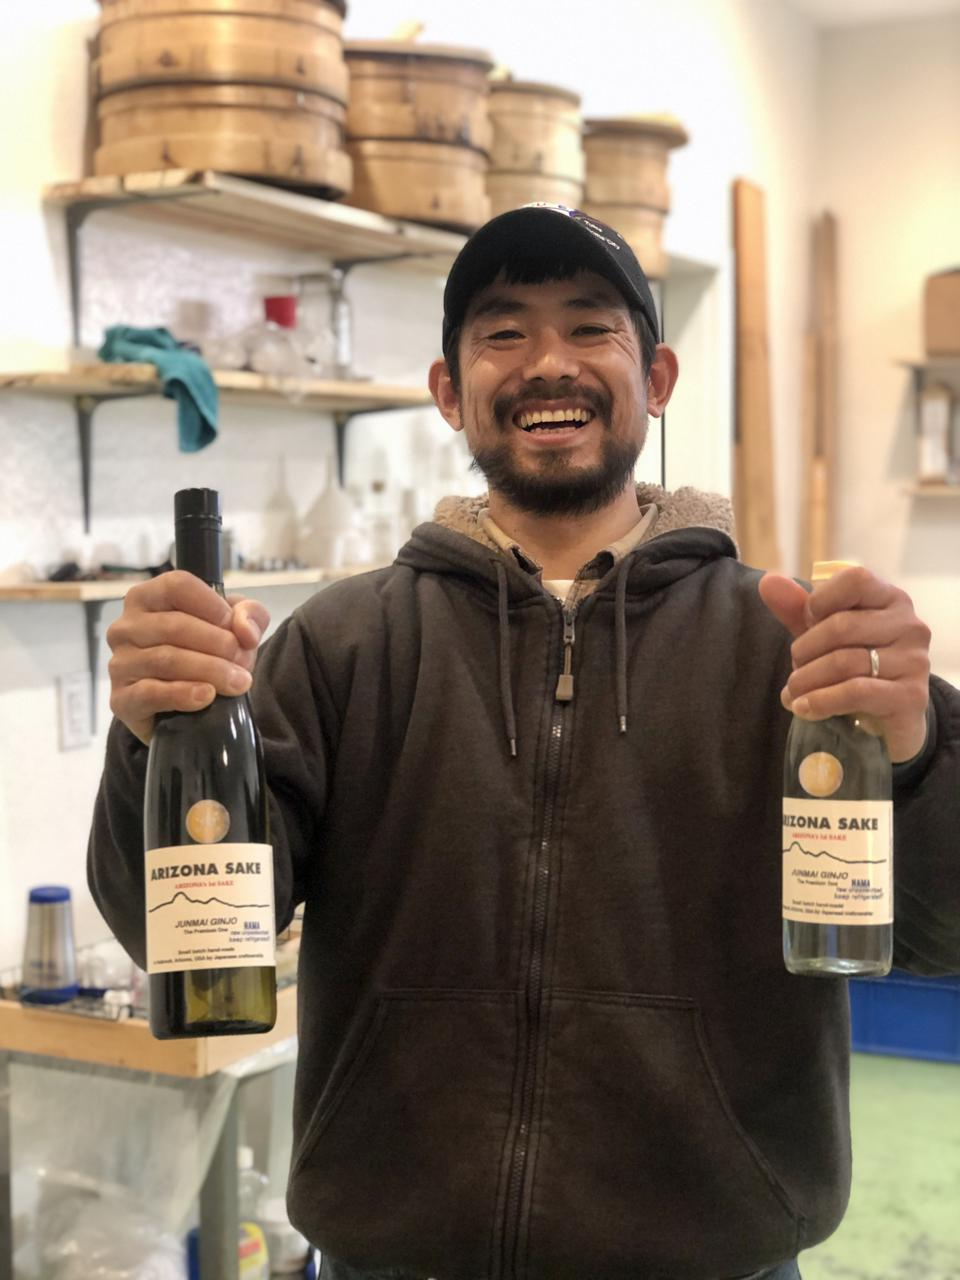 Atsuo Sakurai launched Arizona Sake in the tiny town of Holbrook.